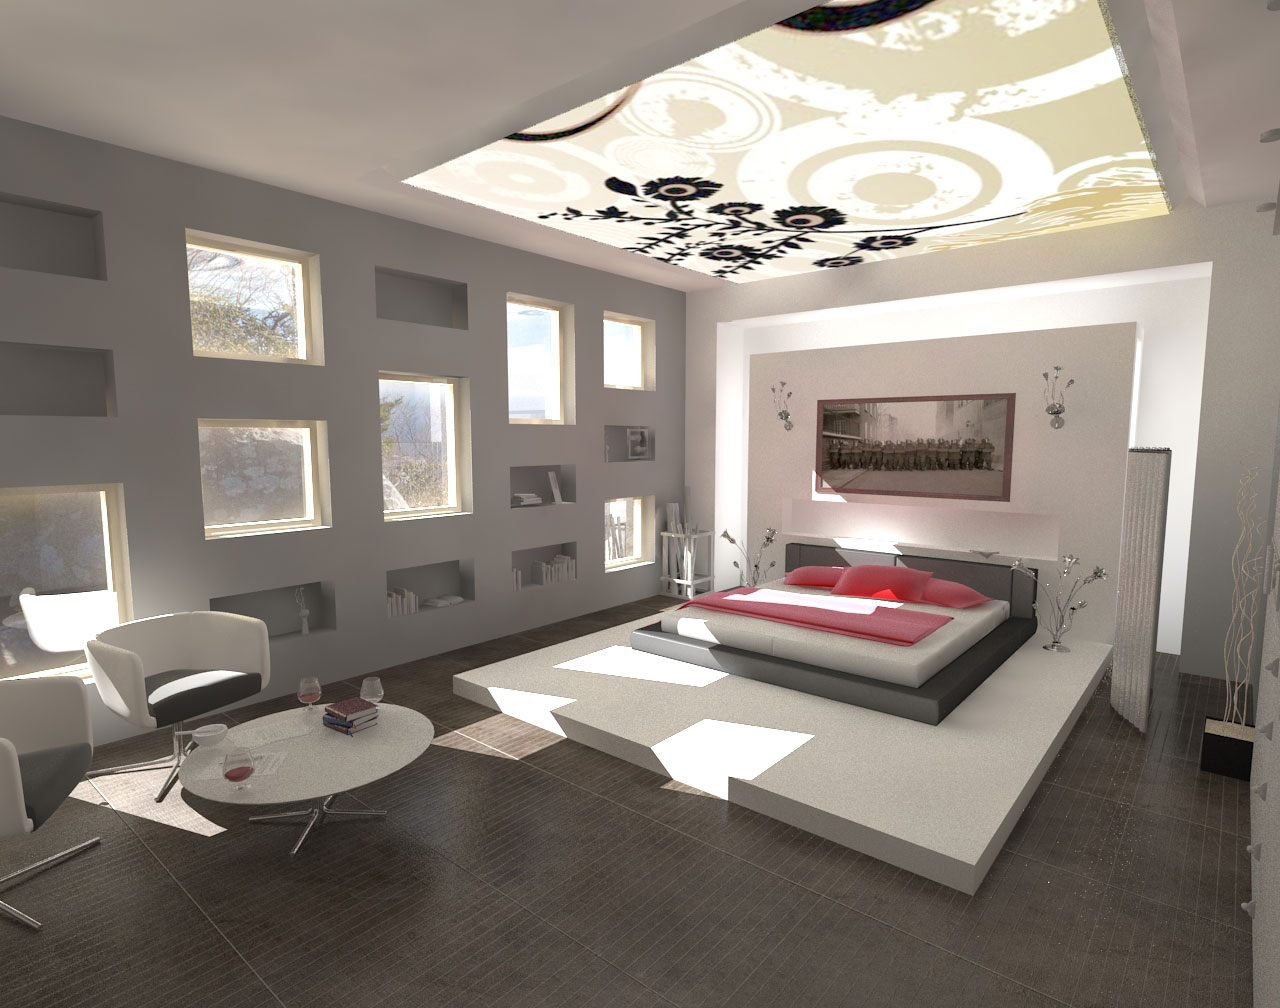 Decorations Minimalist Design  Modern Bedroom Interior Design Ideas